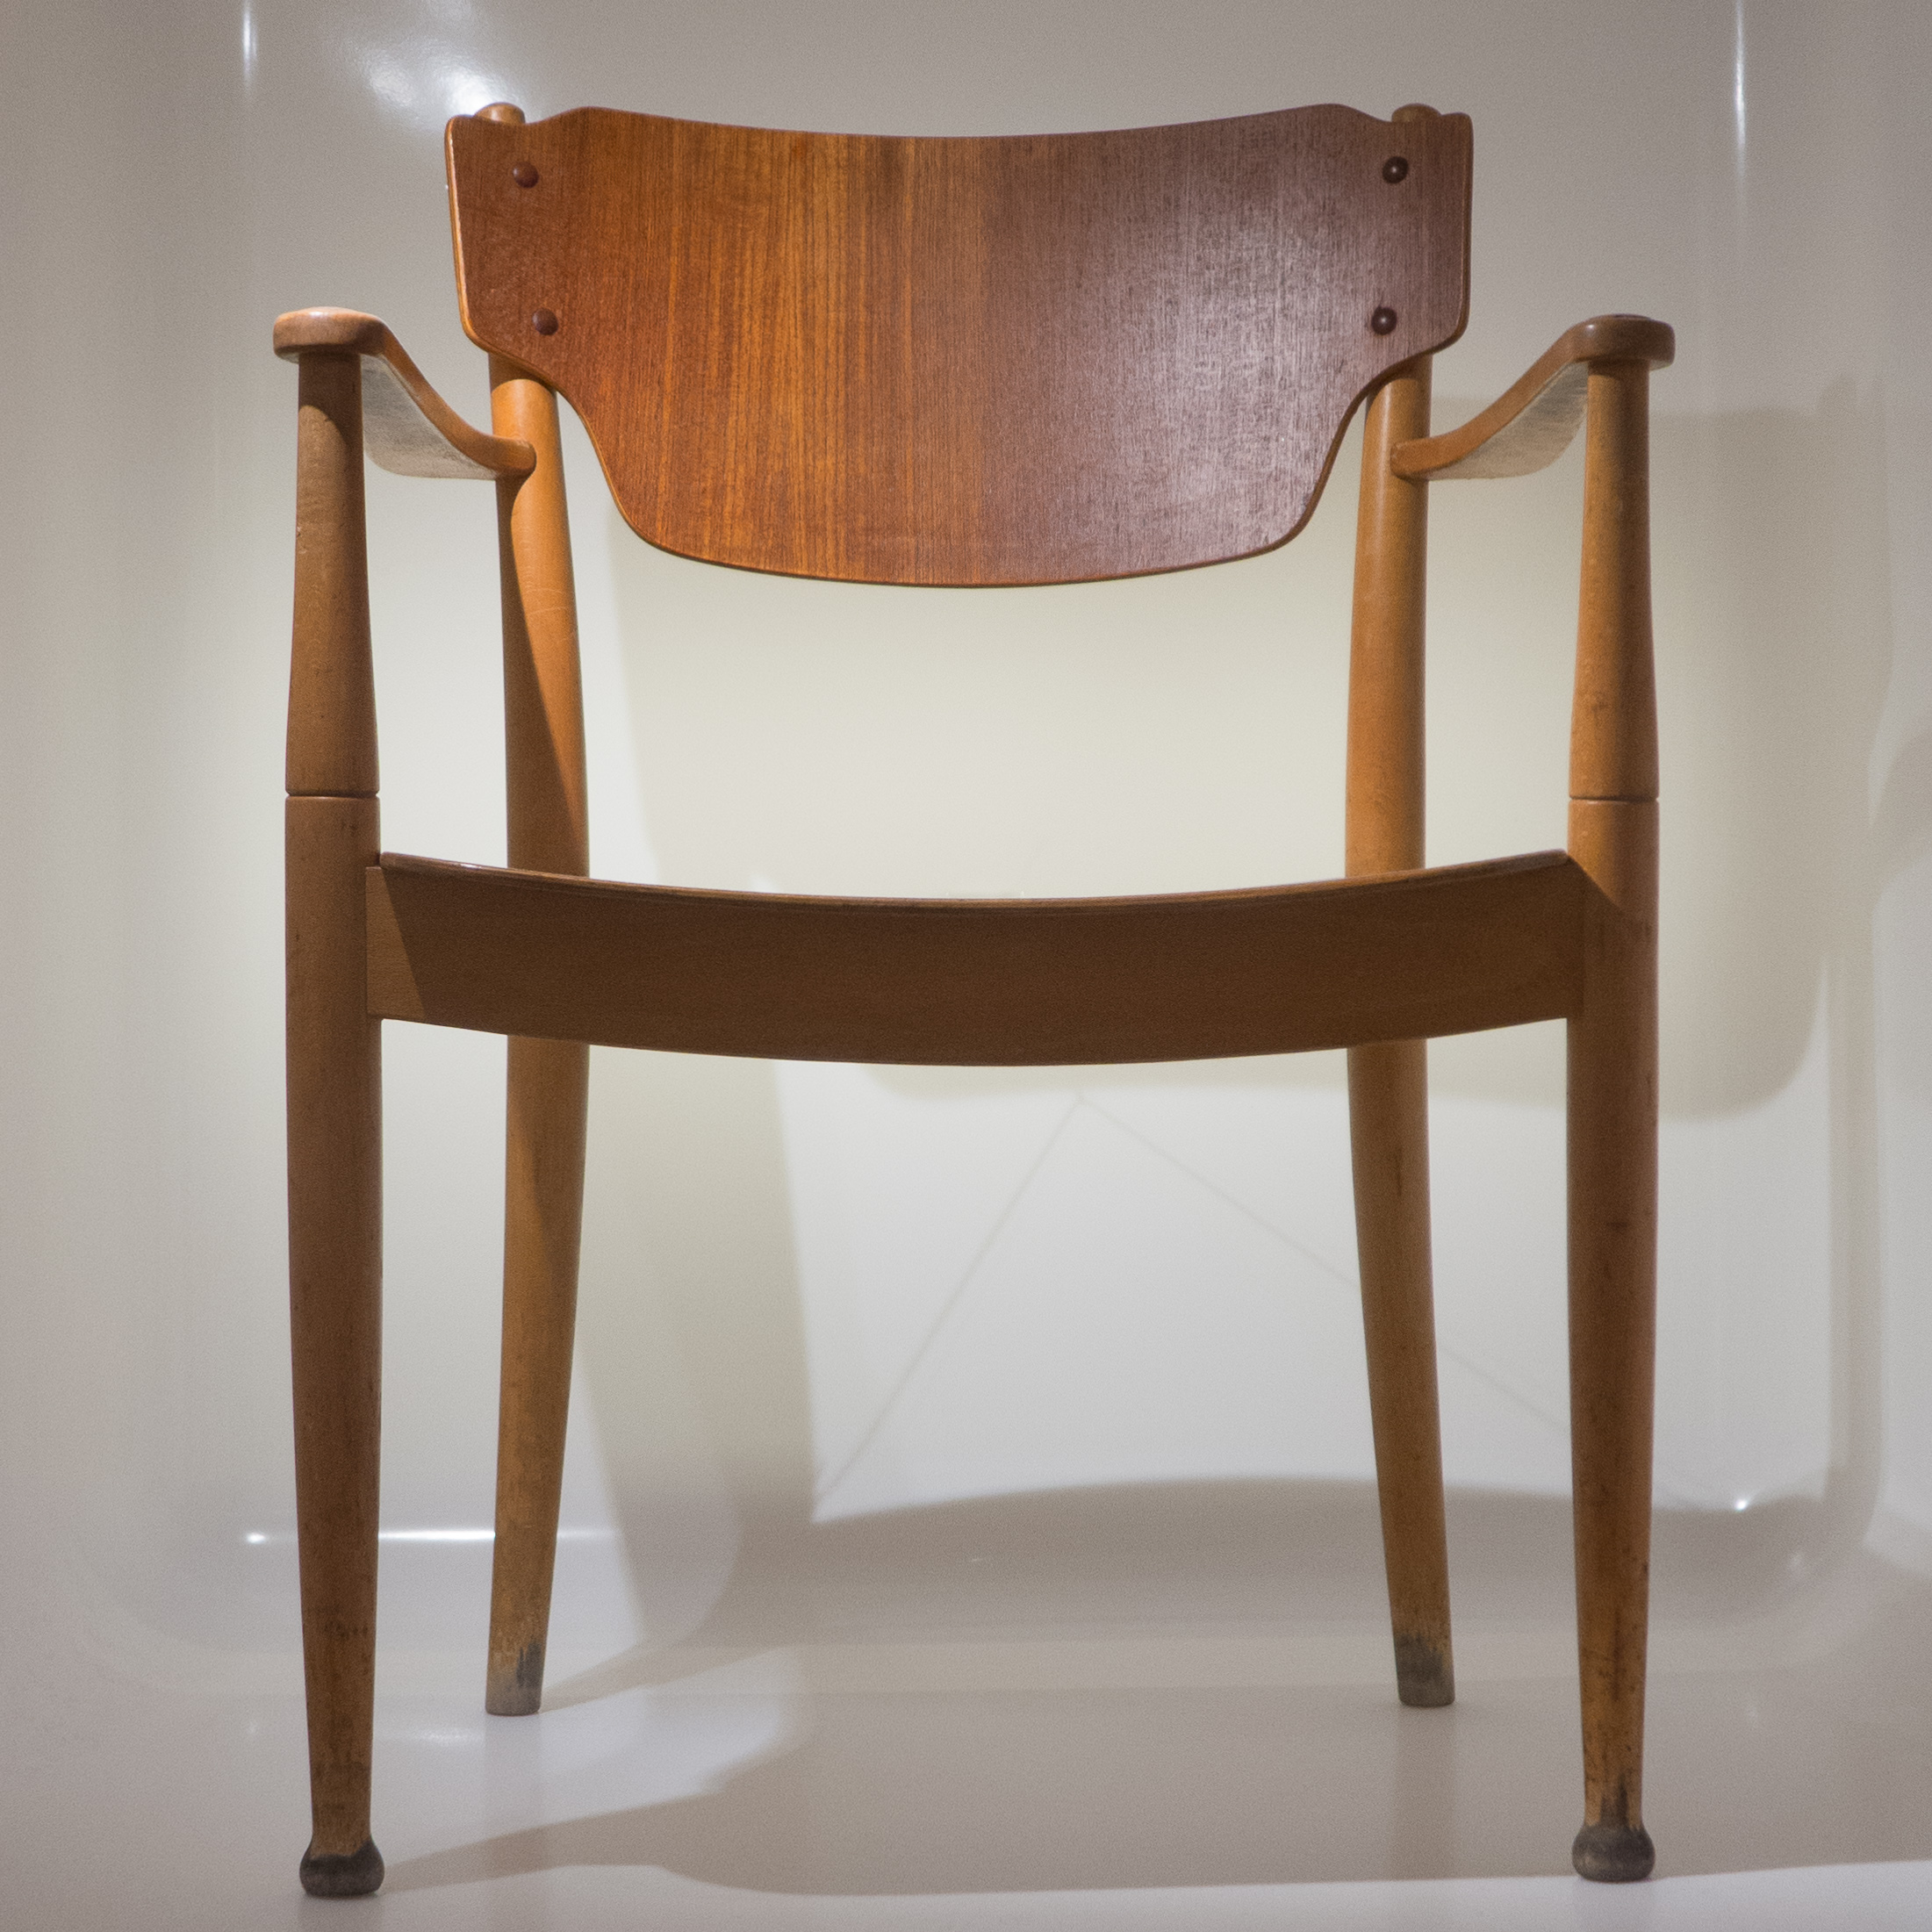 Portex Chair by Peter Hvidt and Orla Mølgaard-Nielsen 1945